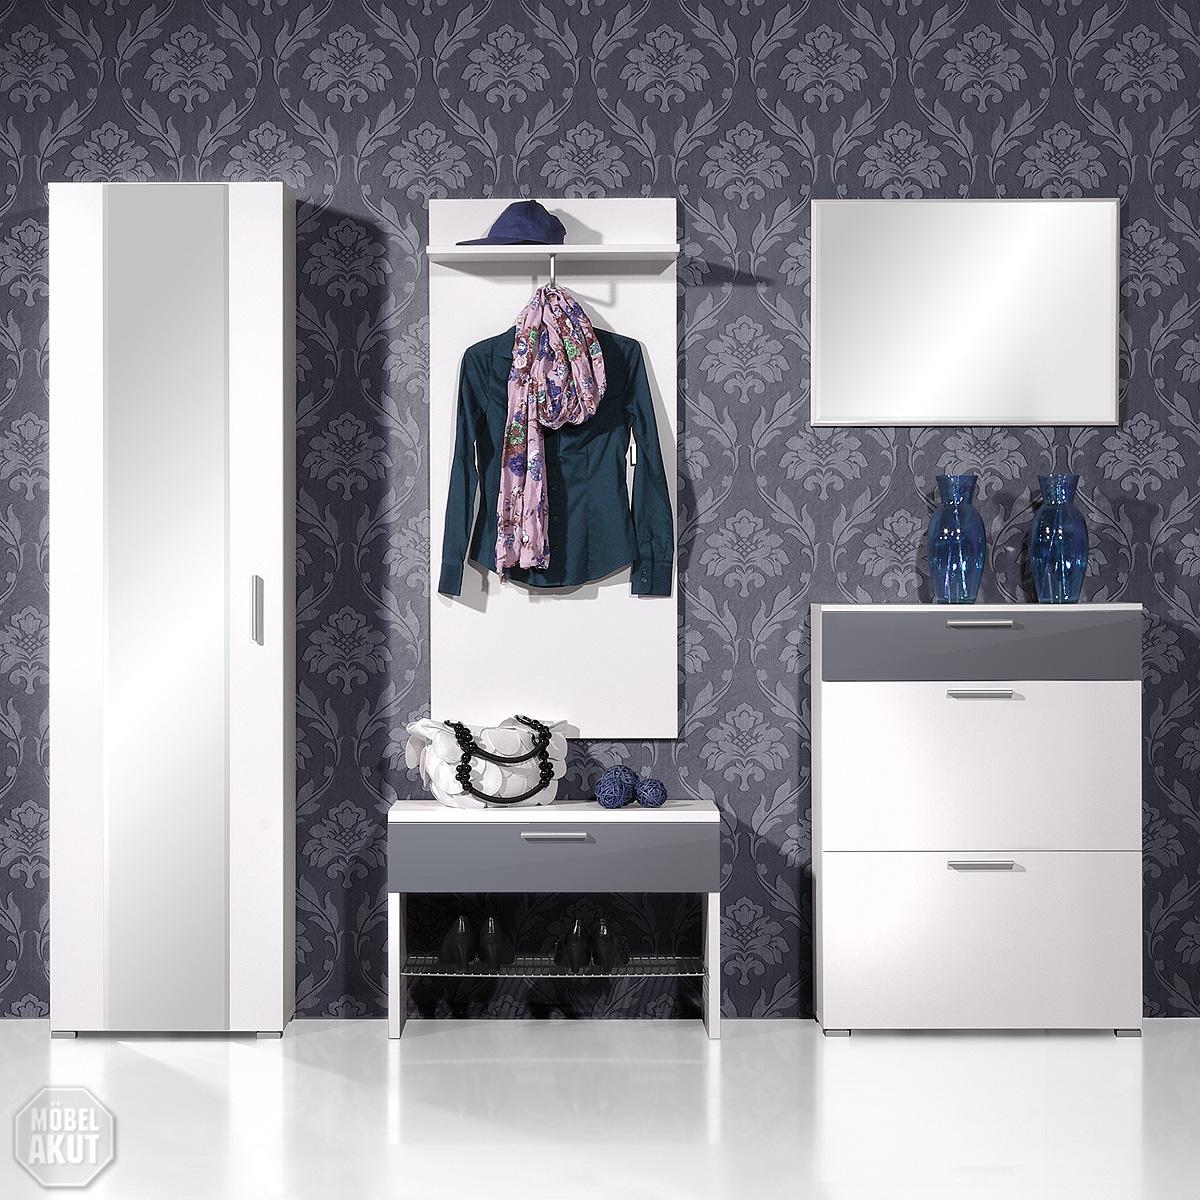 5 tlg garderoben set rios in weiss hochglanz grau. Black Bedroom Furniture Sets. Home Design Ideas